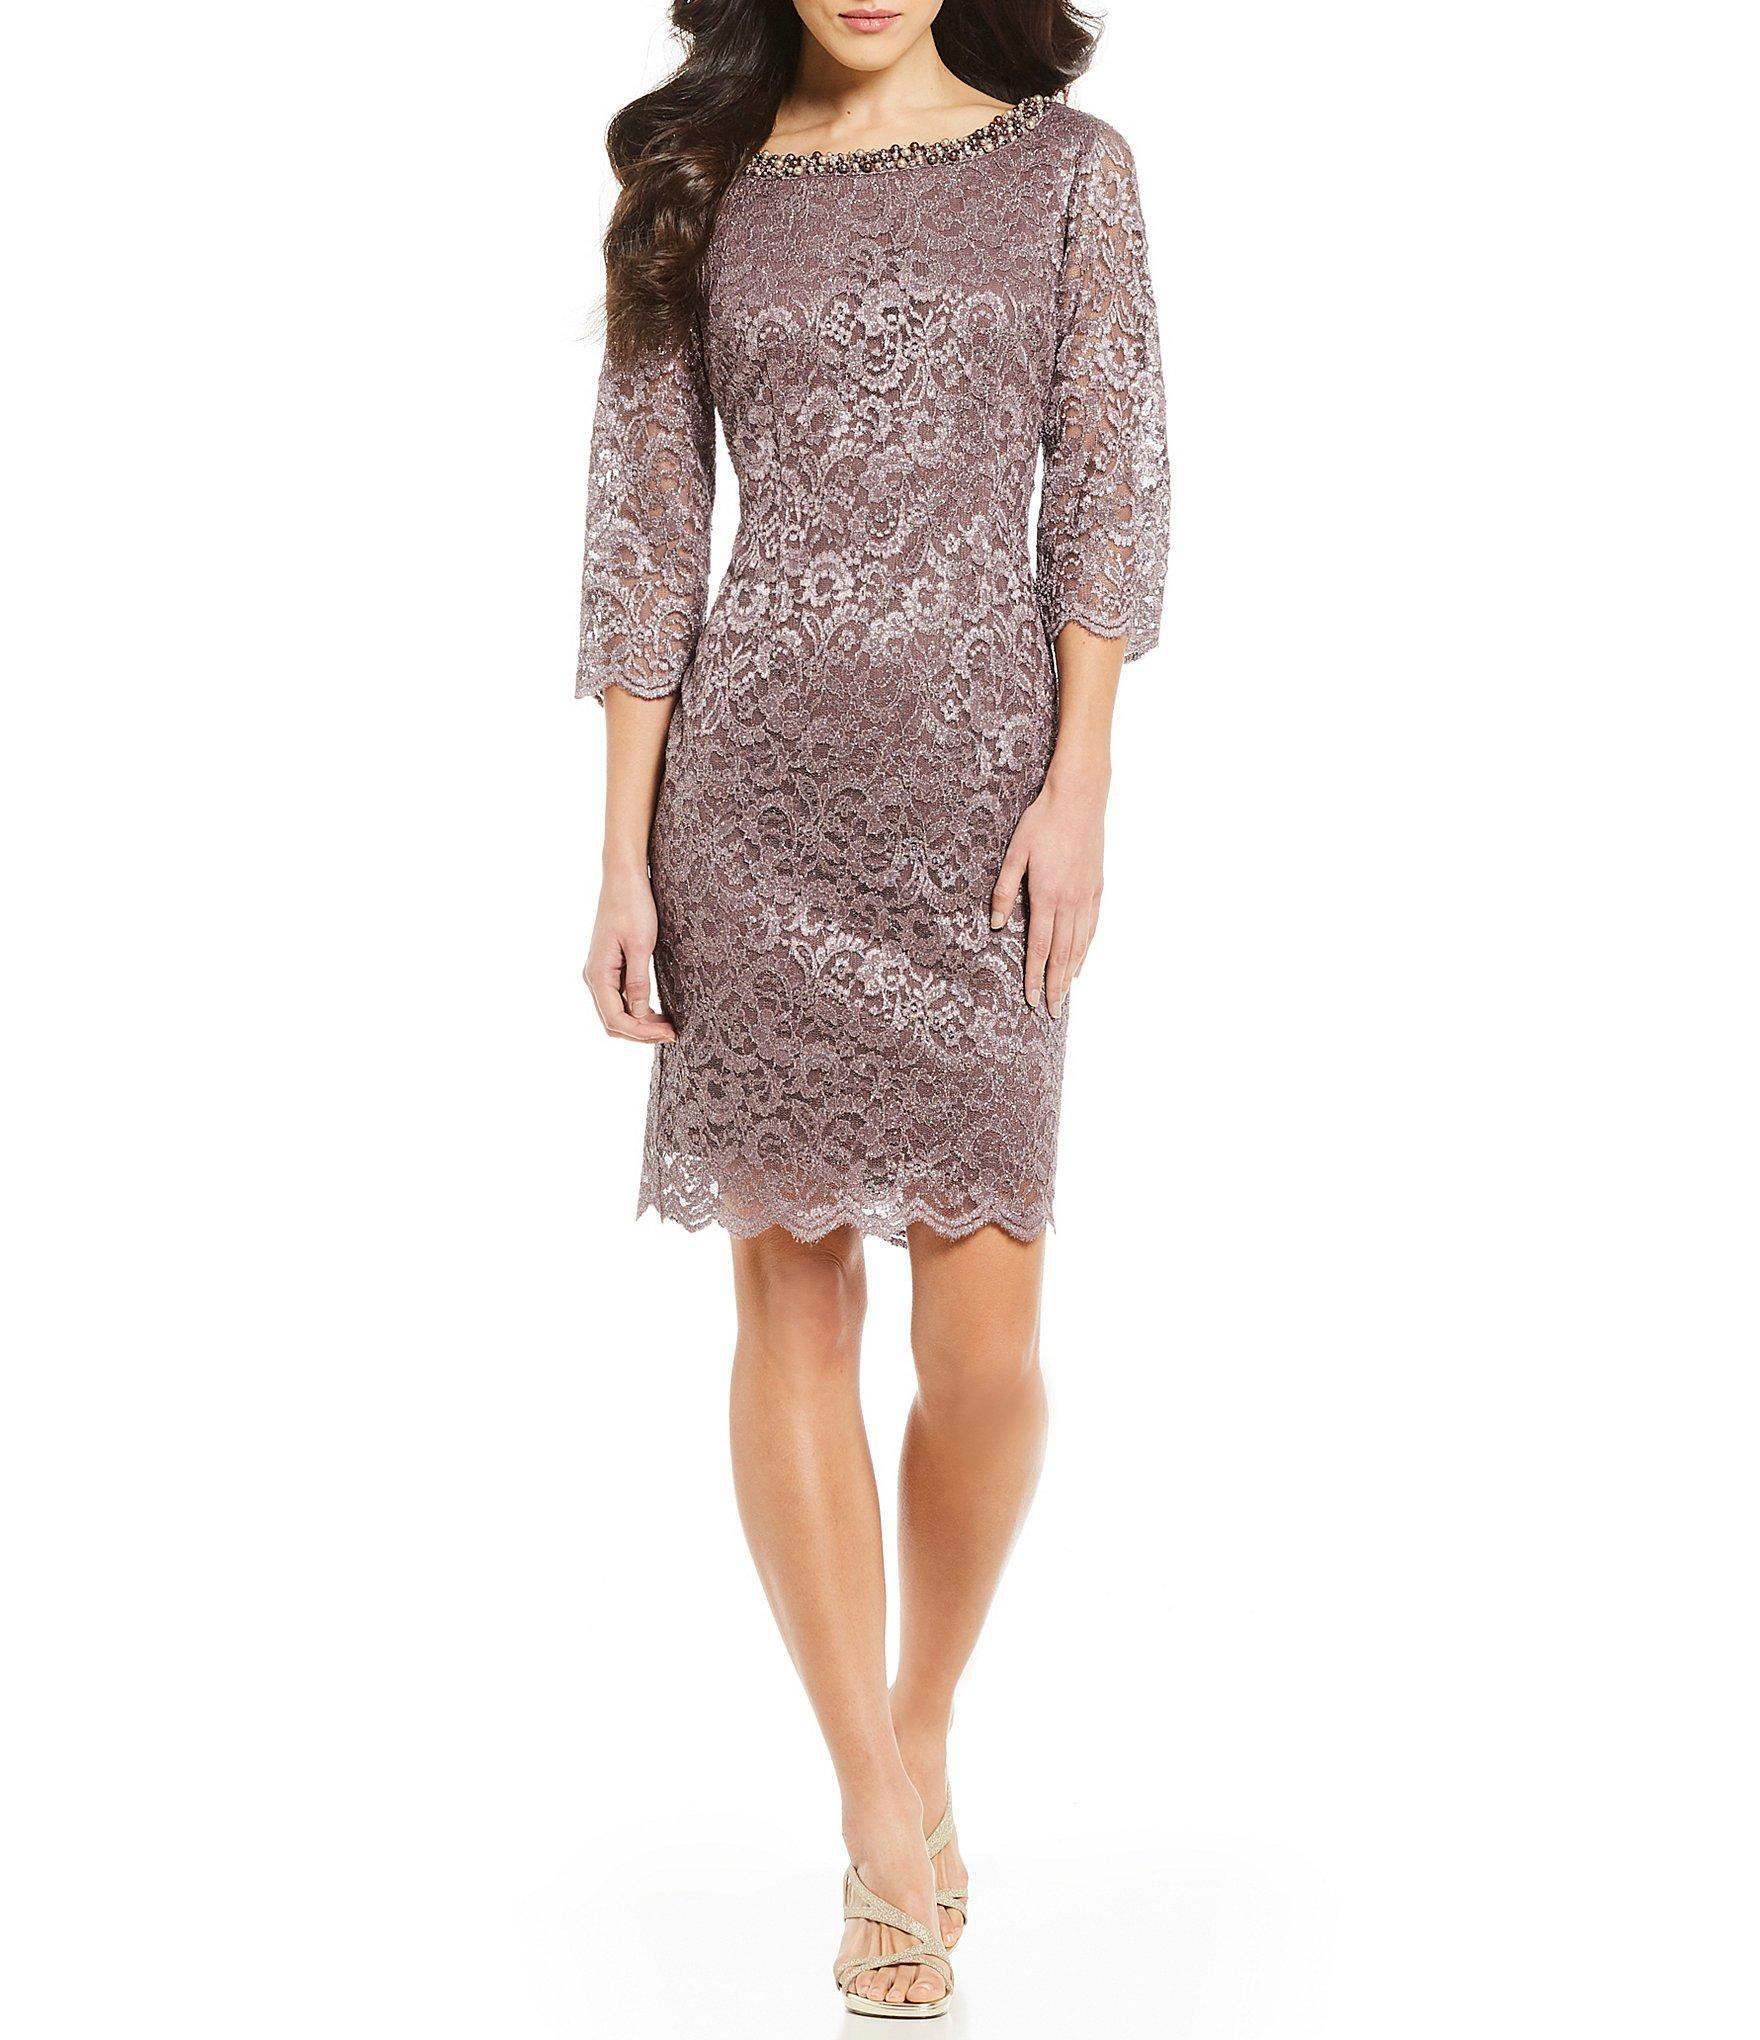 972c836f0e Lyst - Alex Evenings Petite Size Glitter Lace Sheath Dress